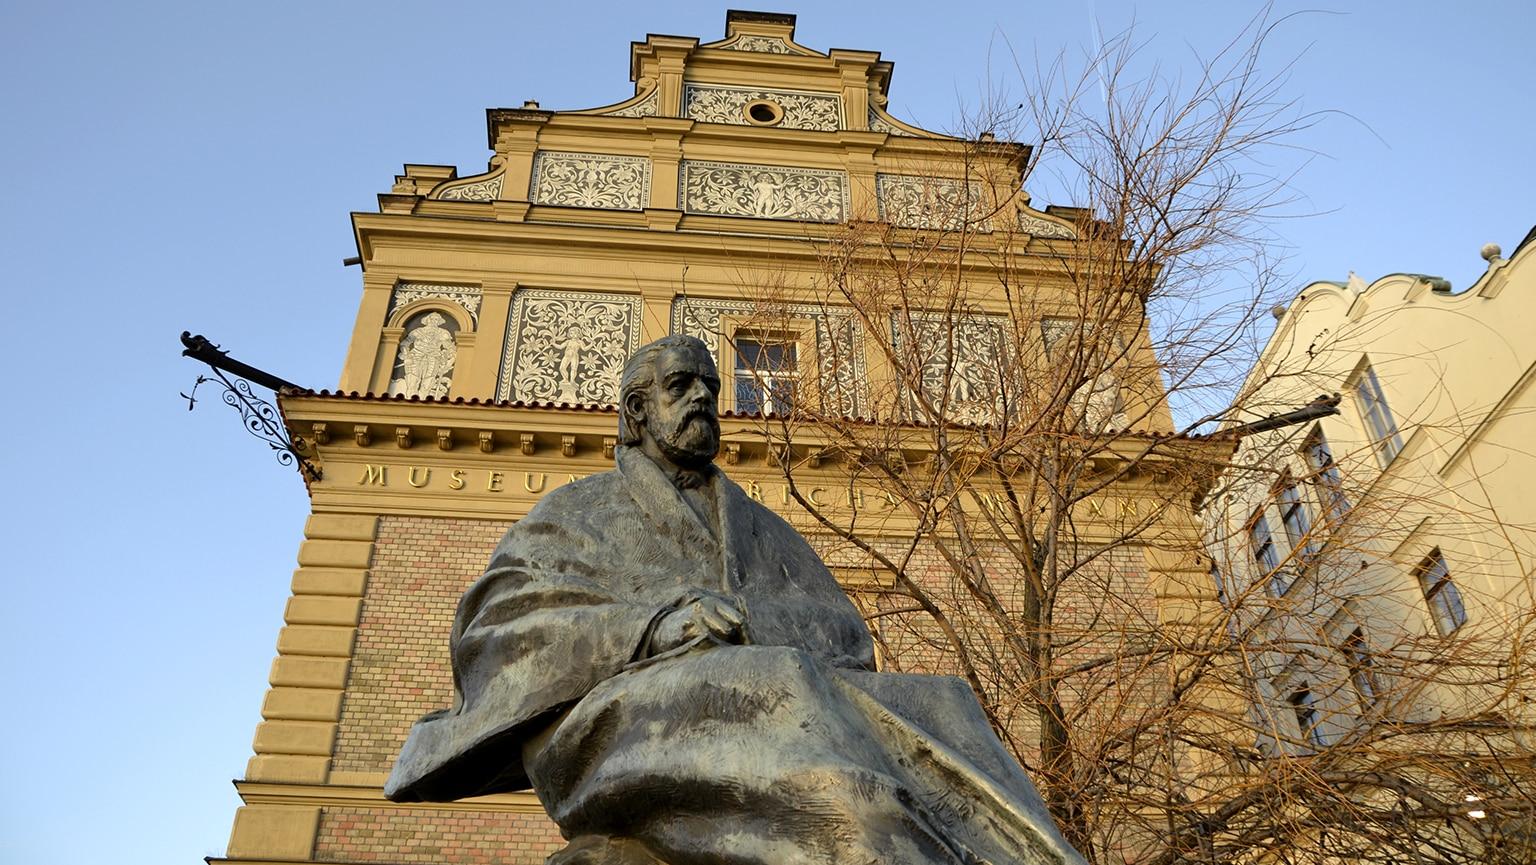 Bedrich Smetana—Má Vlast